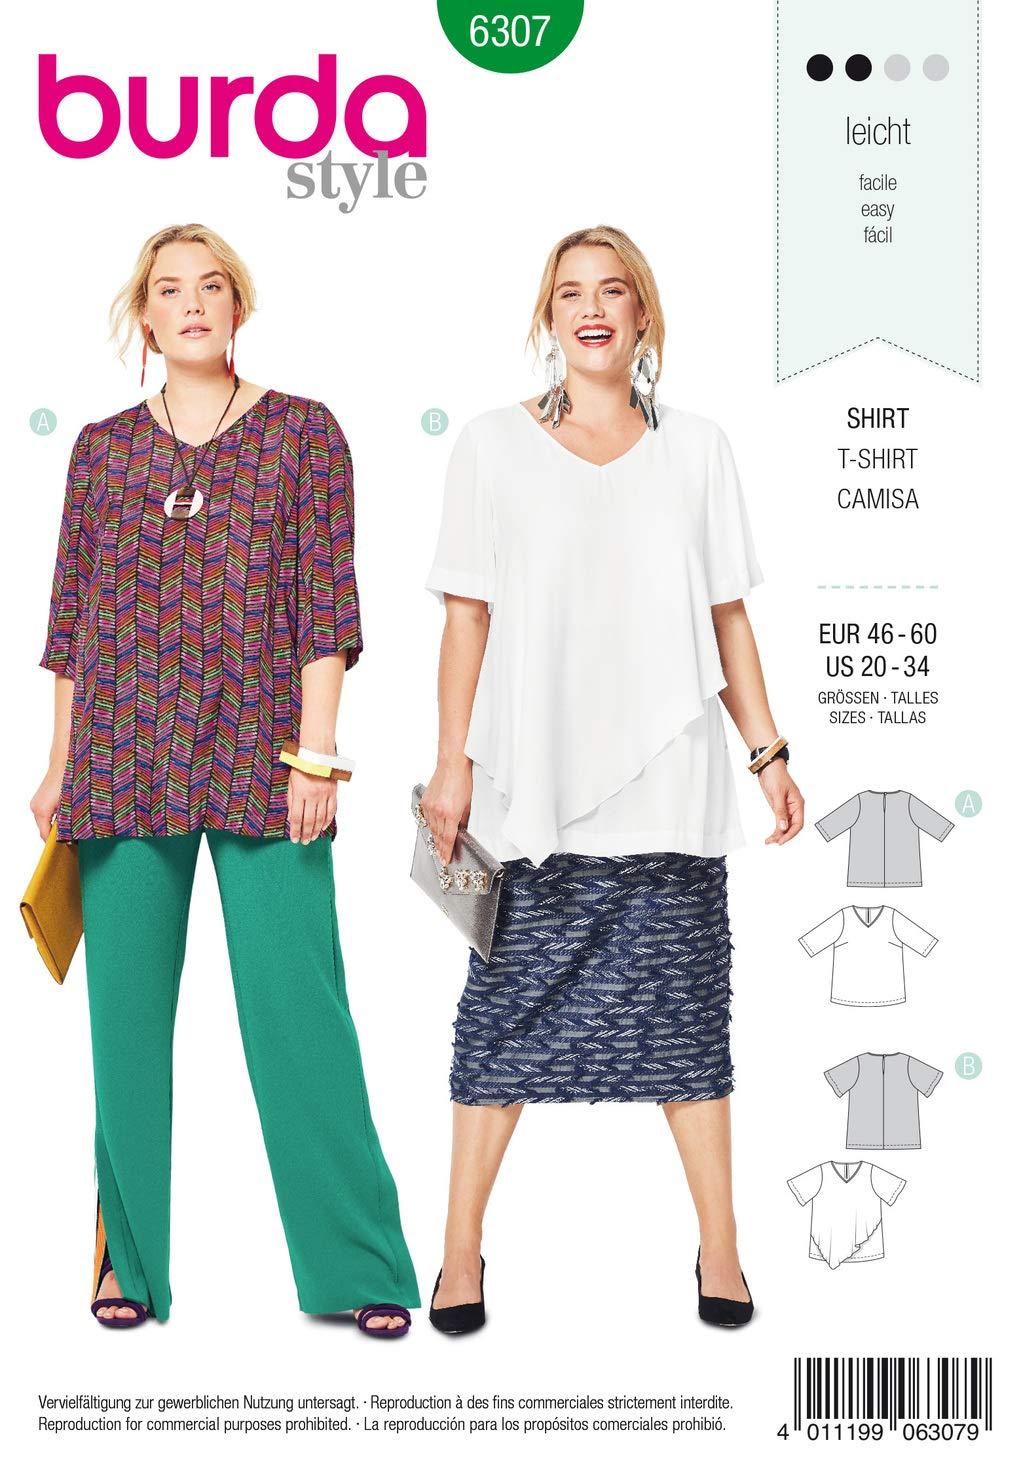 Gratis Minerva Crafts Craft Guide Burda Damen Schnittmuster 6684/Kleid /& Bluse Tops